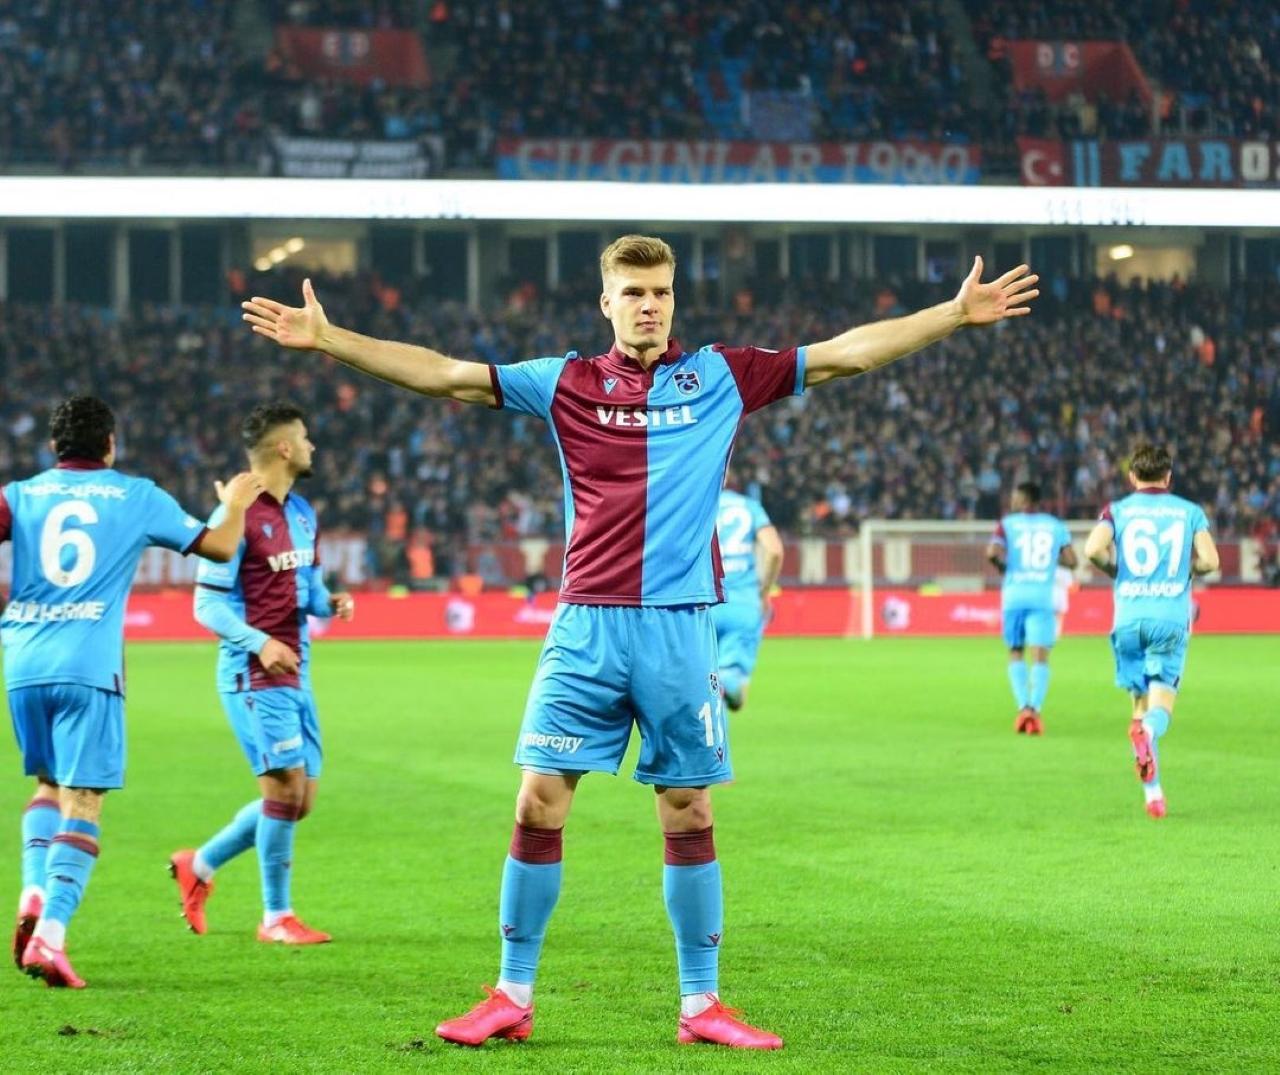 Sorloth Trabzonspor